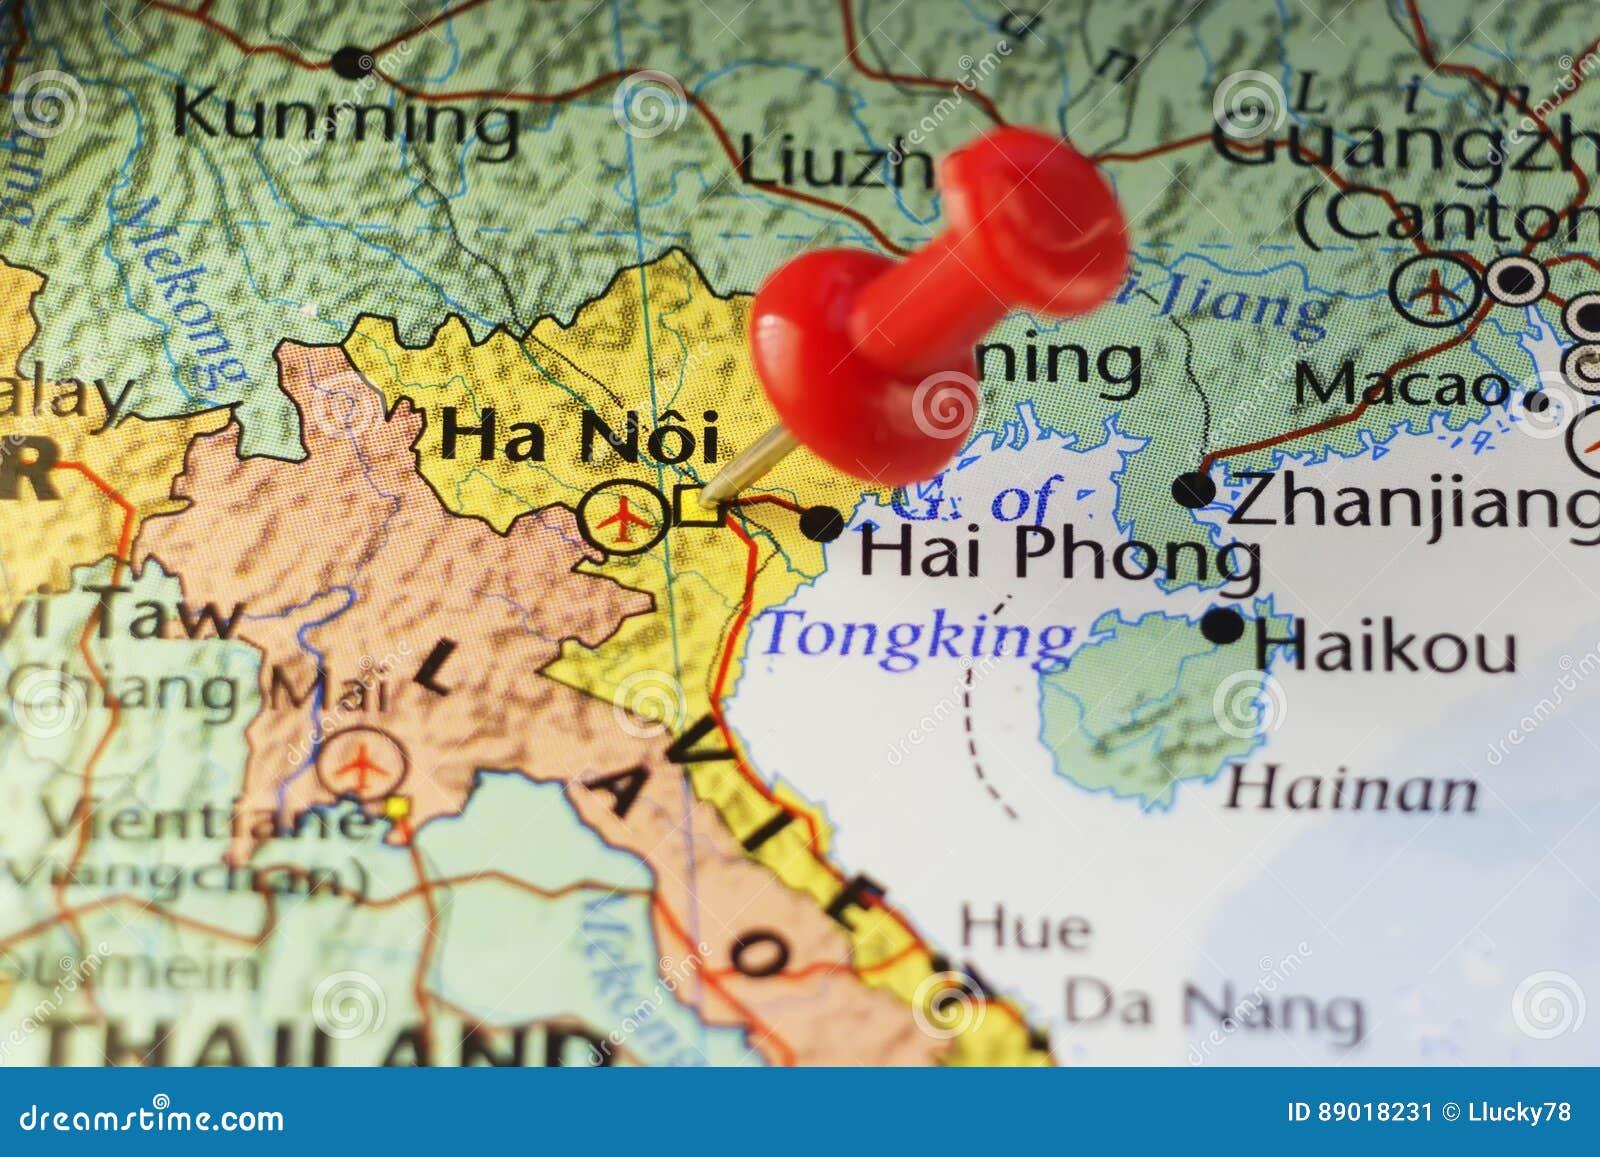 Ha Noi Vietnam Map.Hanoi Capital City Of Vietnam Stock Image Image Of Pushpin Travel